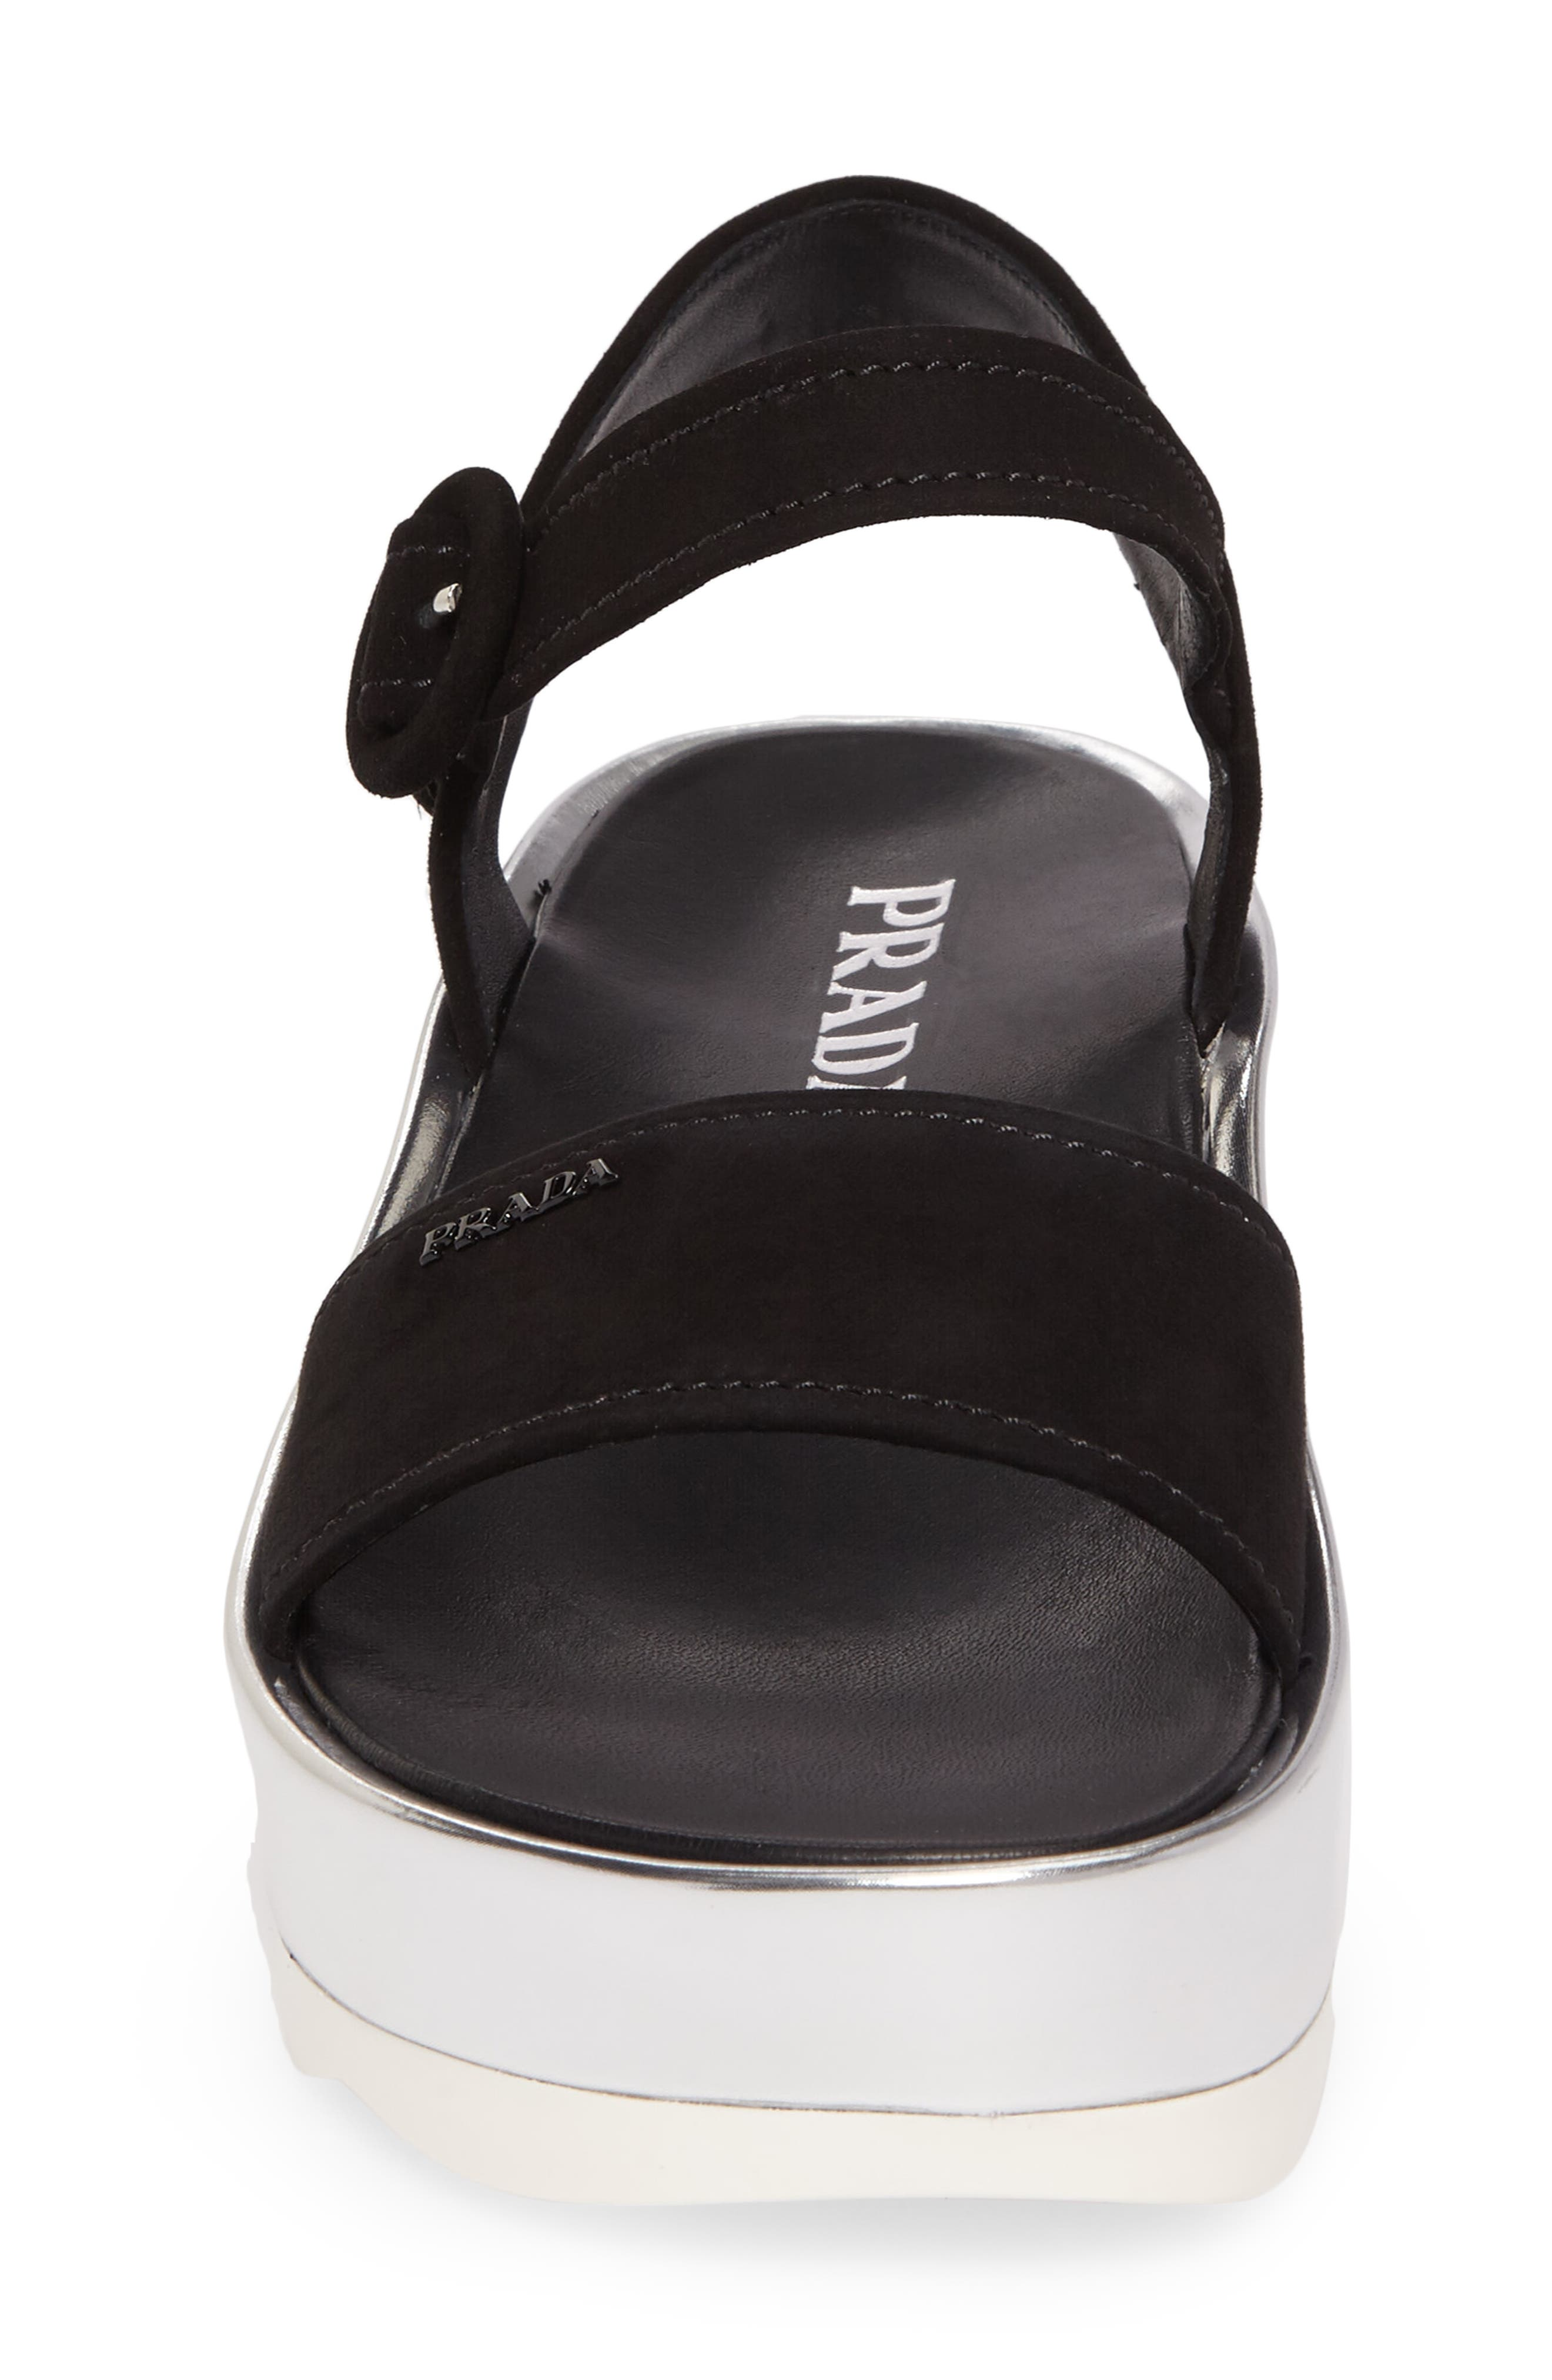 Platform Sandal,                             Alternate thumbnail 4, color,                             001